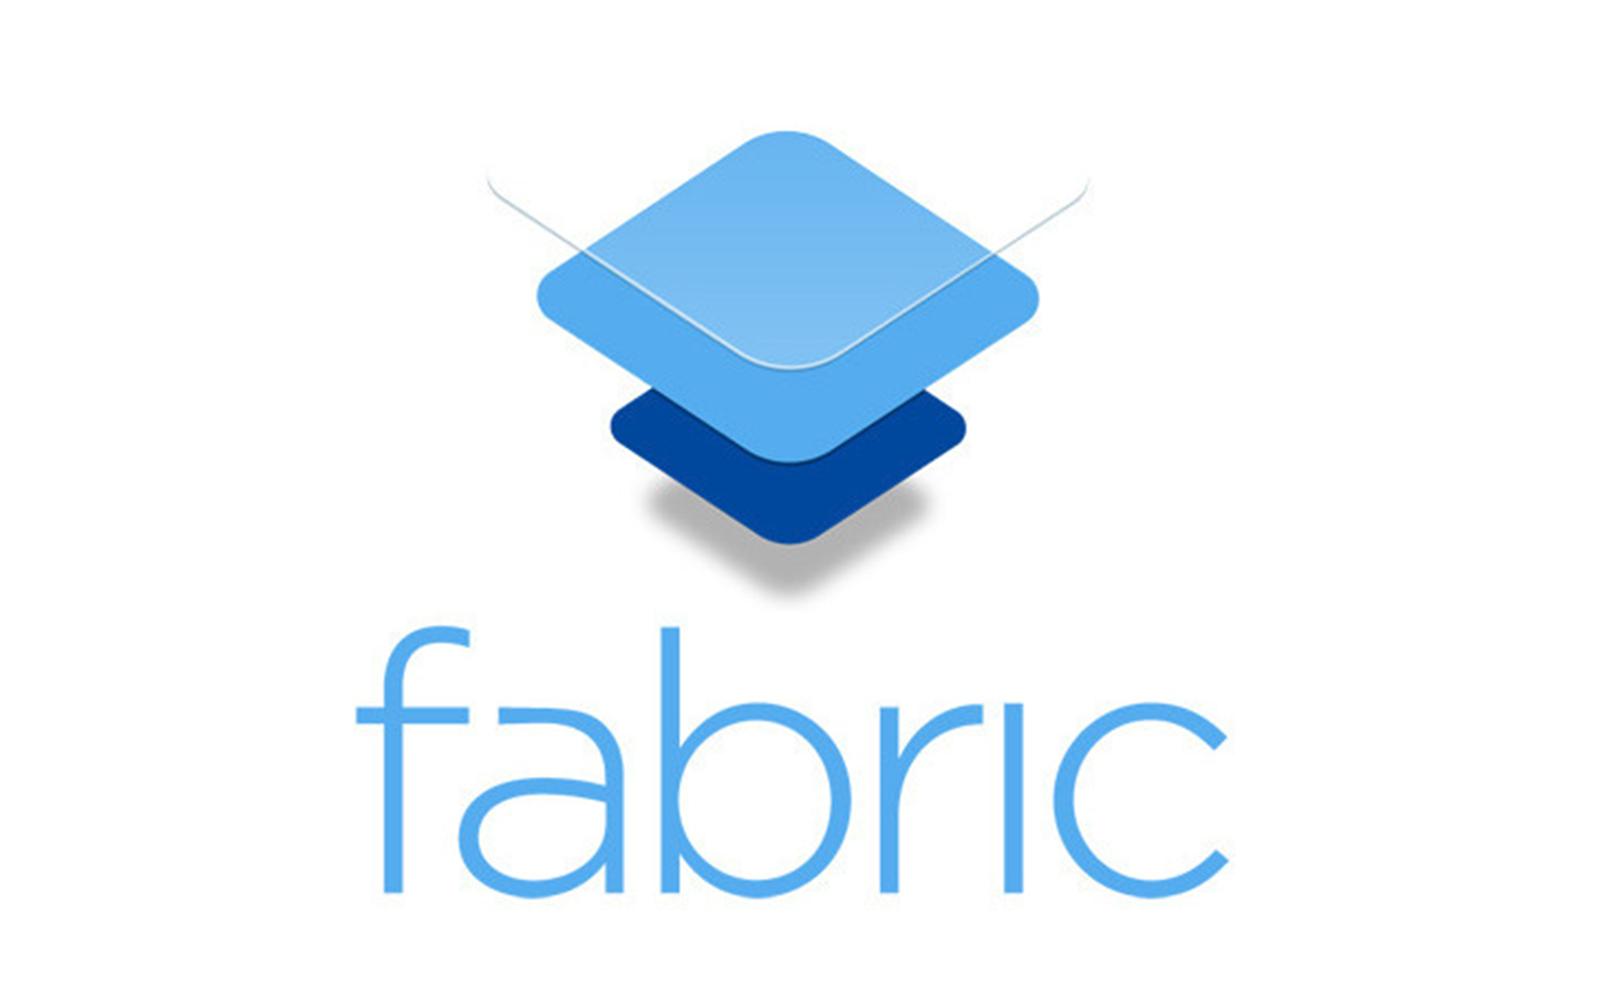 FabricBlogLogo